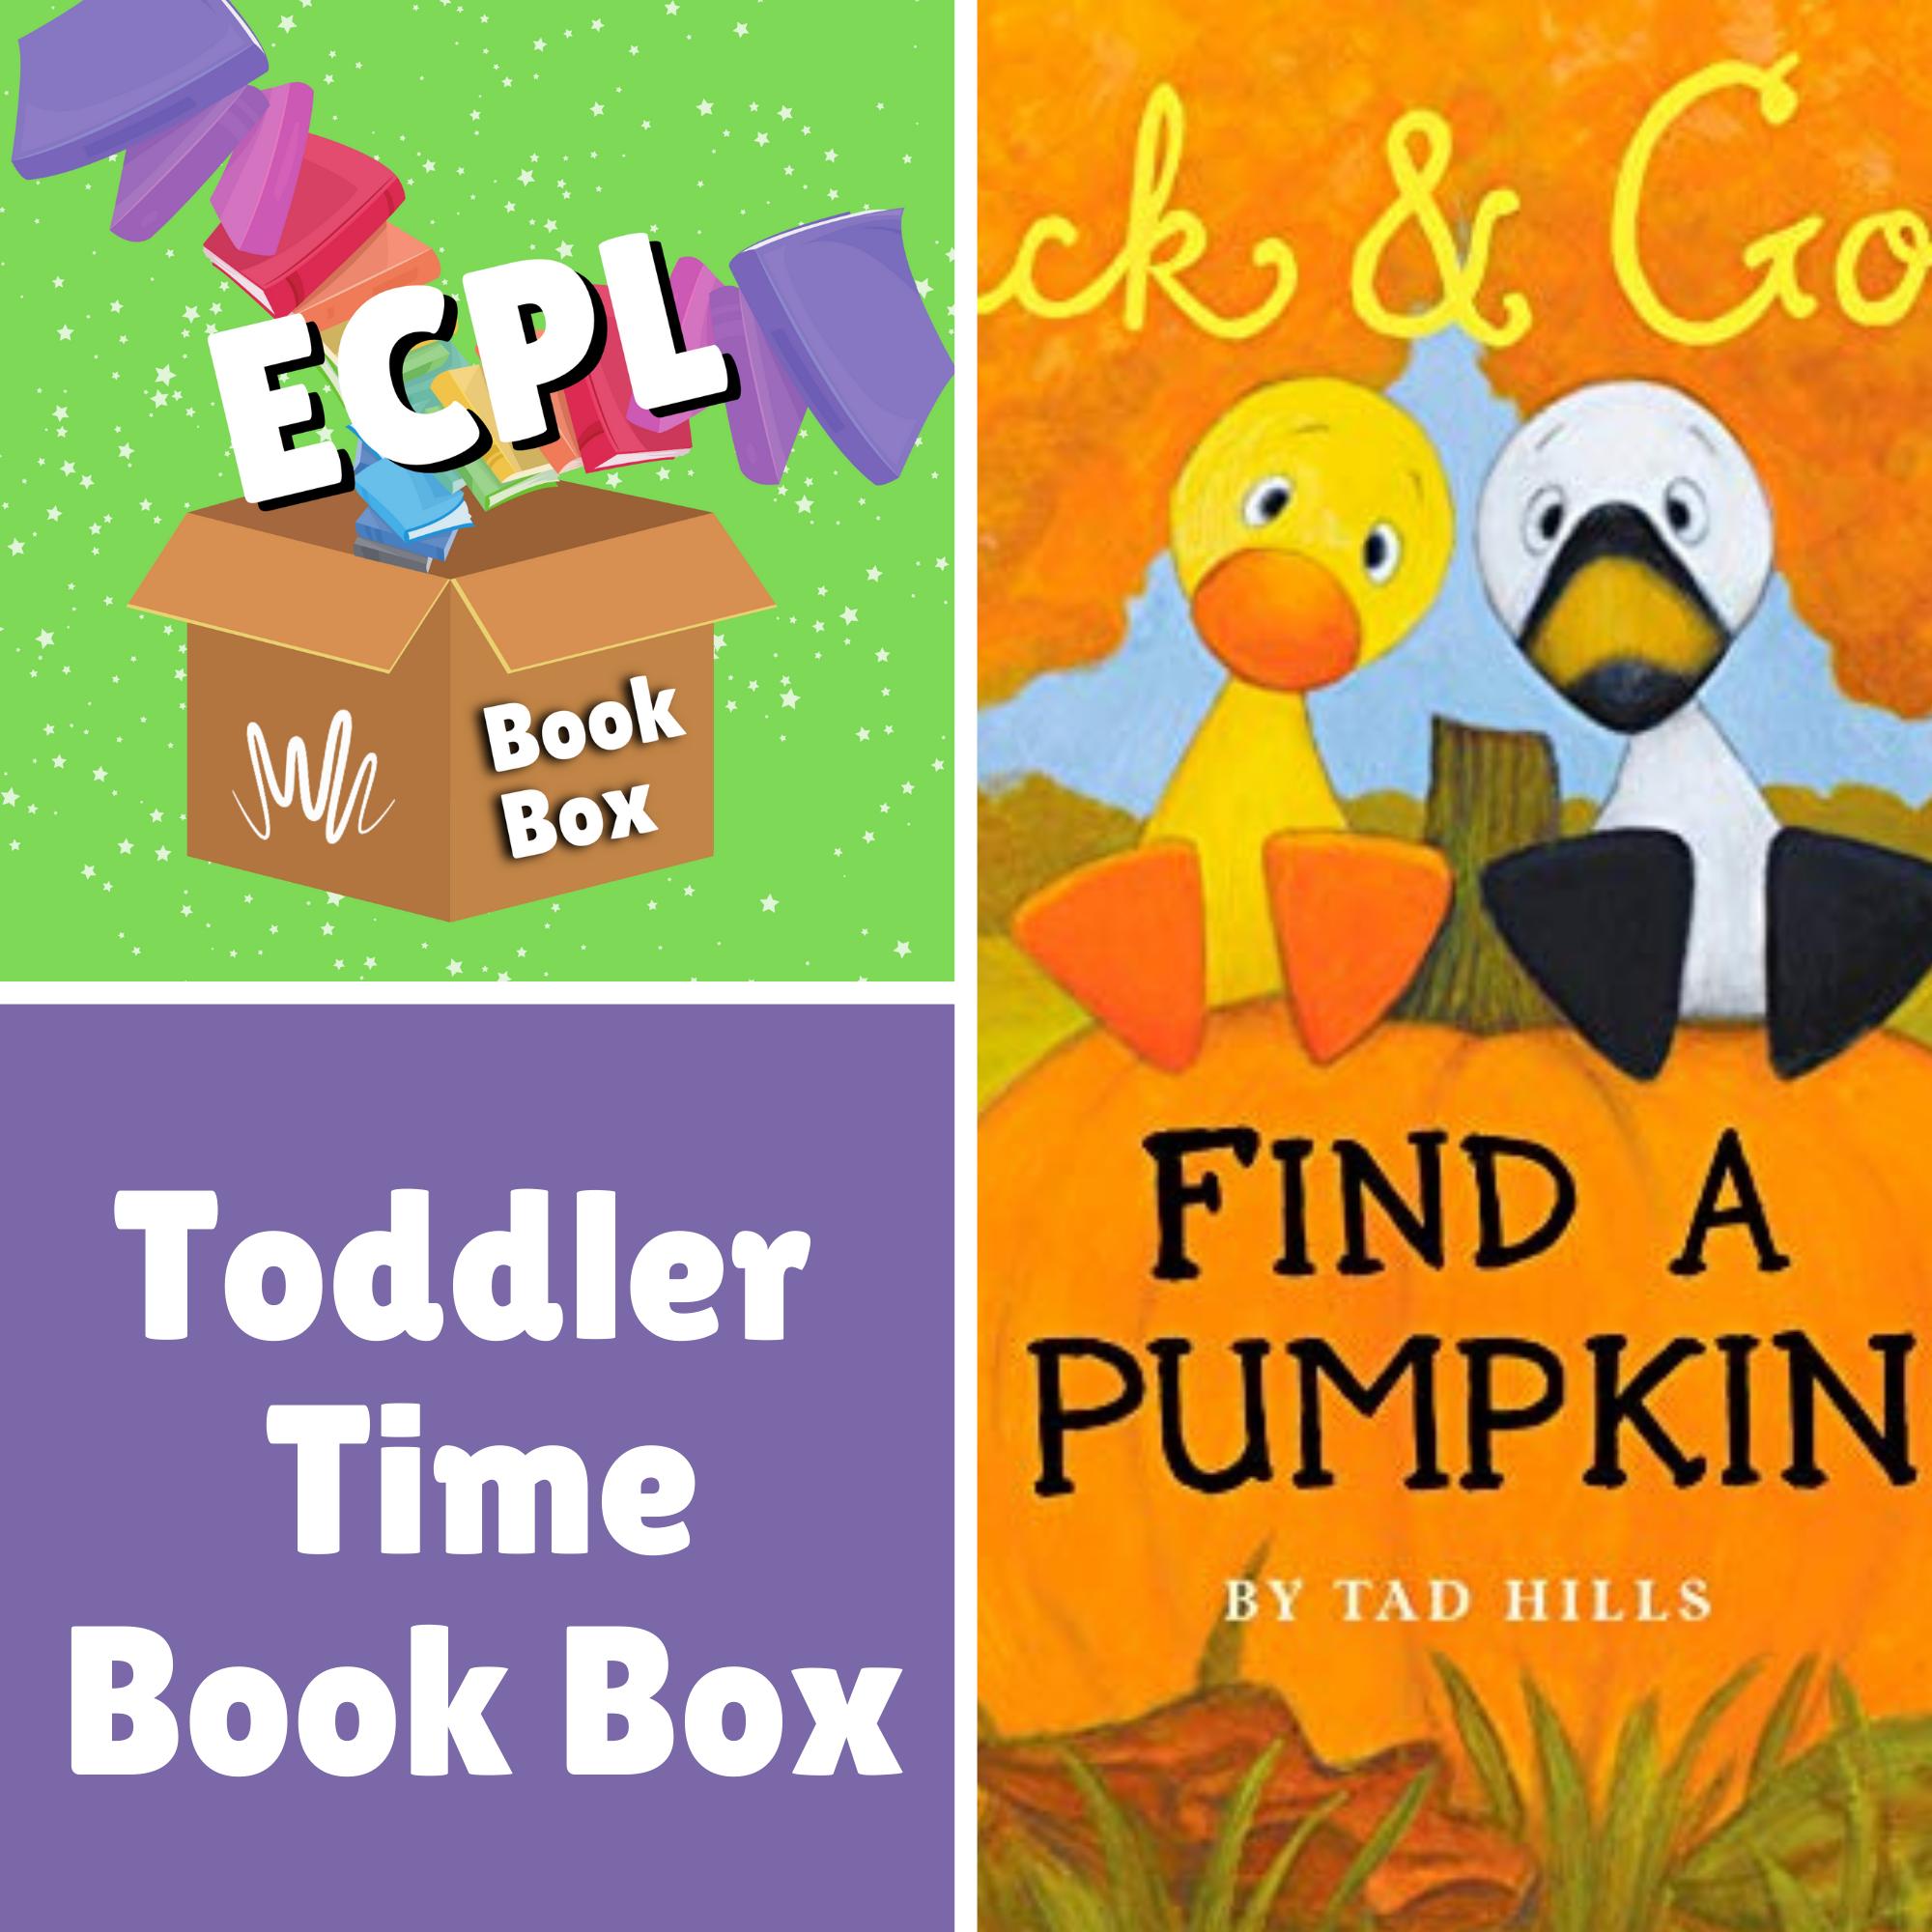 Toddler Time Book Box - Duck & Goose Find a Pumpkin